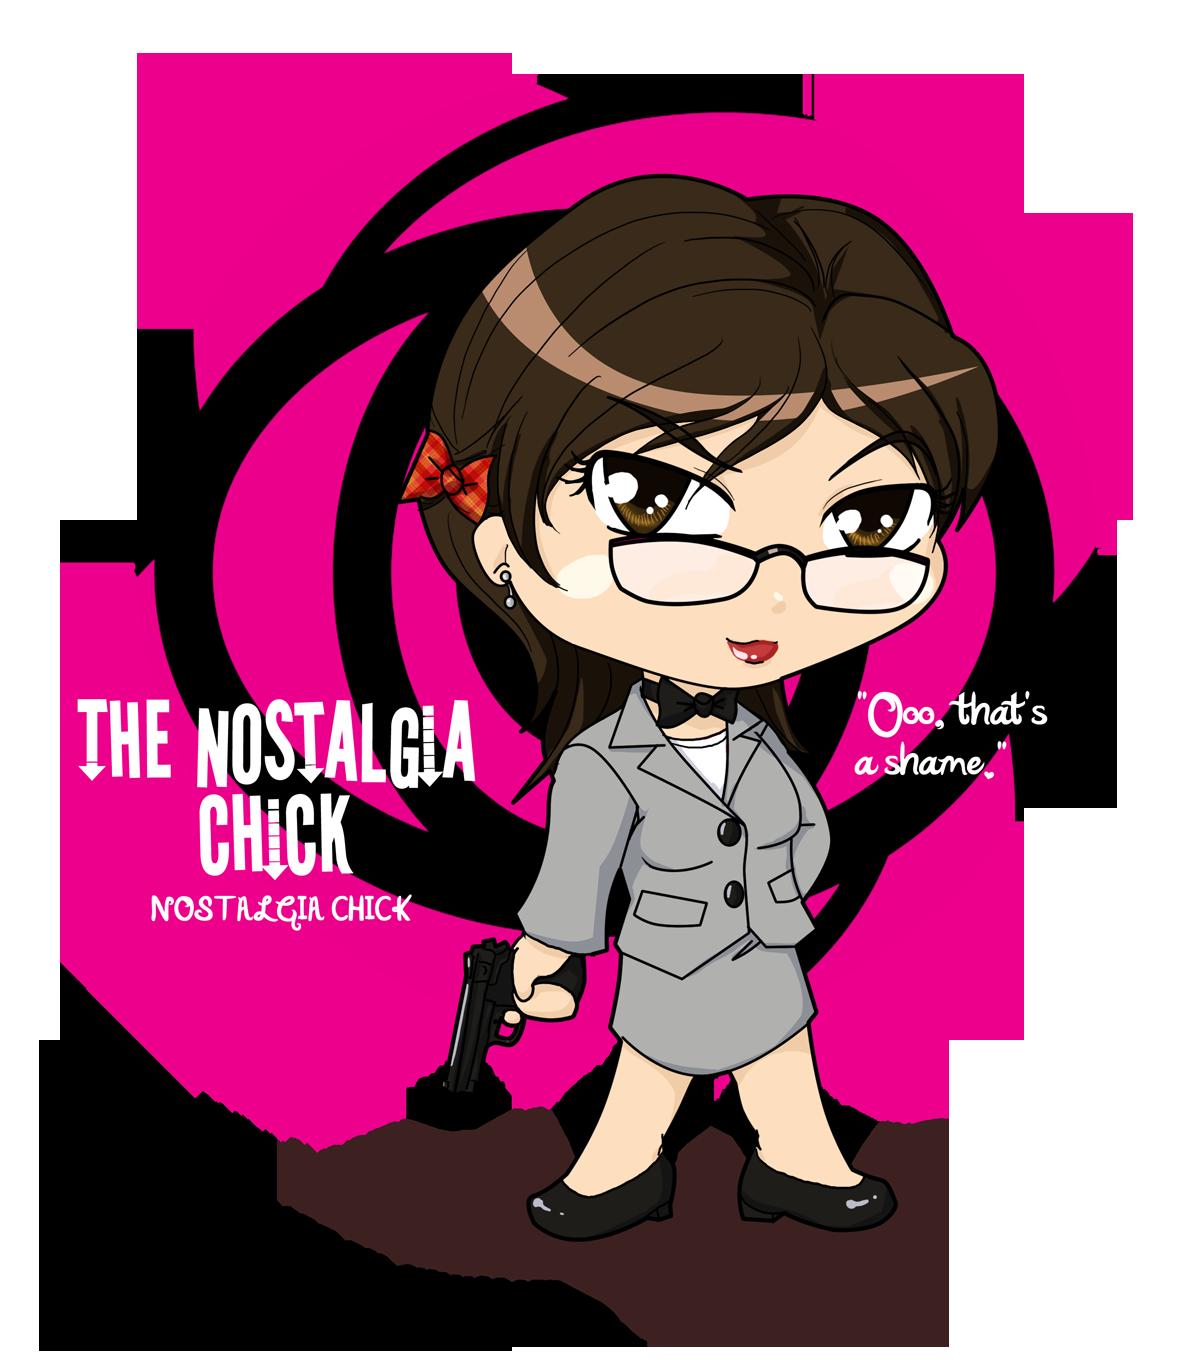 Kickassia: Nostalgia Chick by sylvacoer on DeviantArt